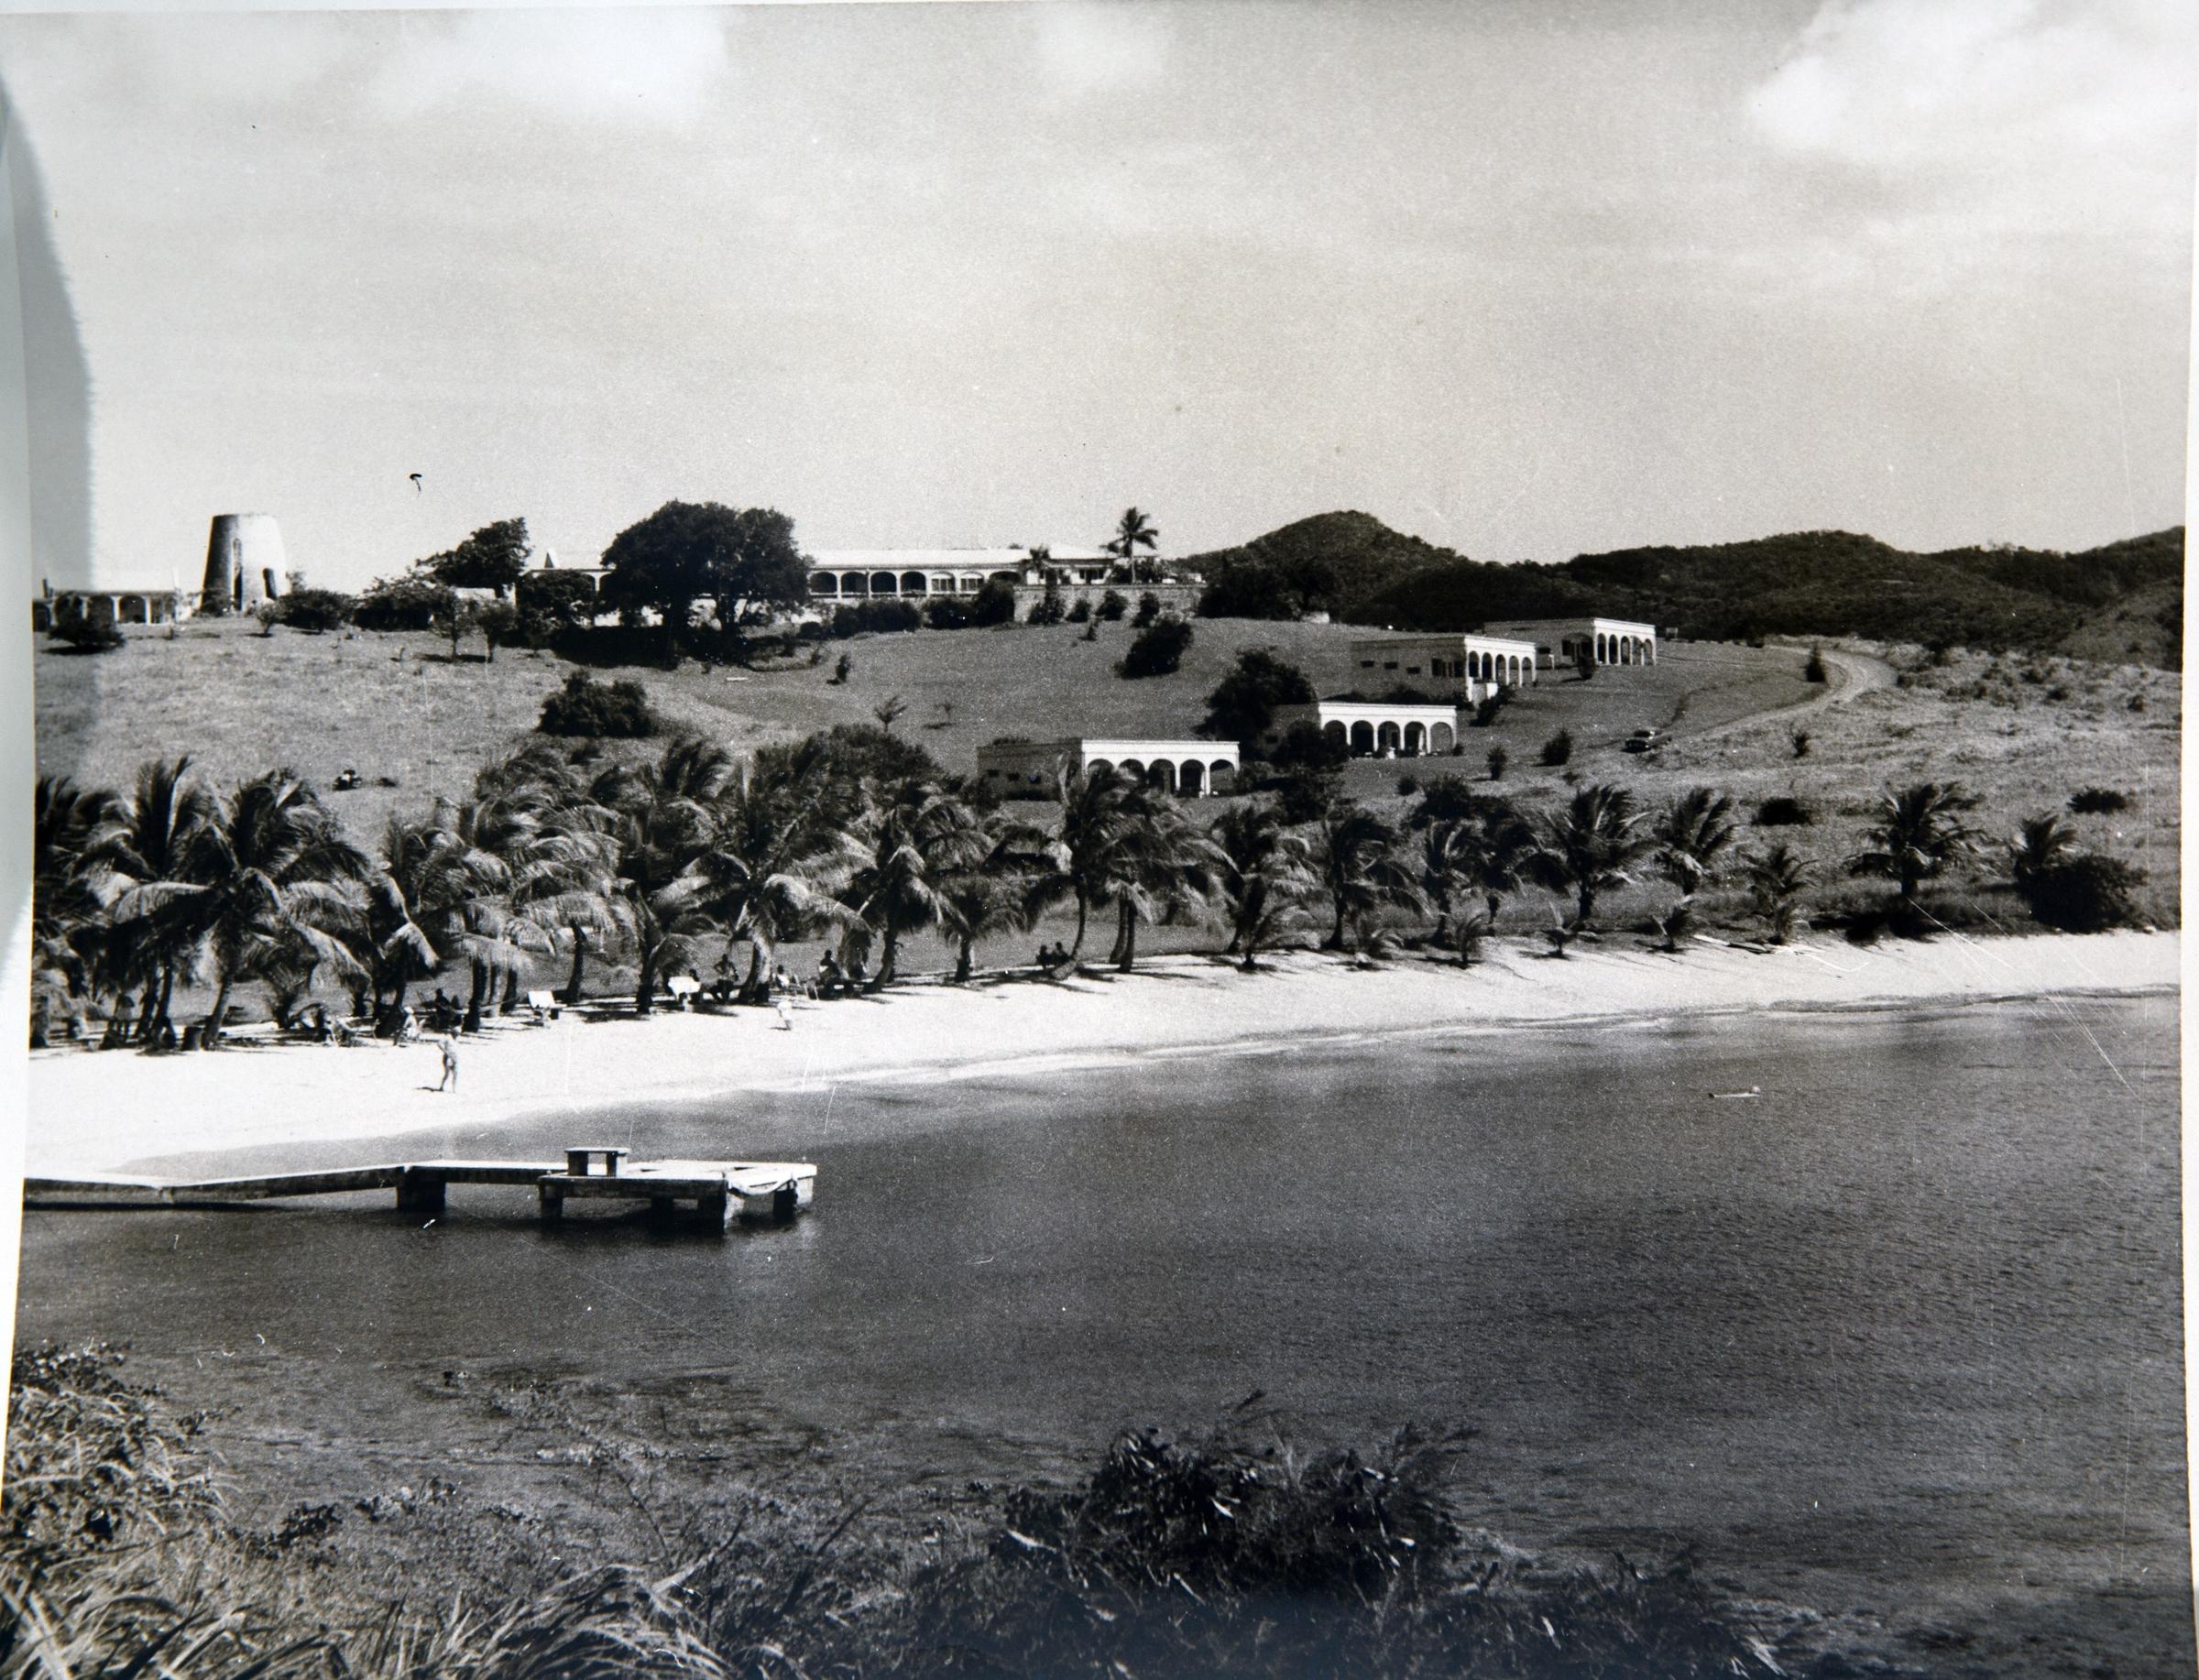 Black & white historical photo of The Buccaneer Resort